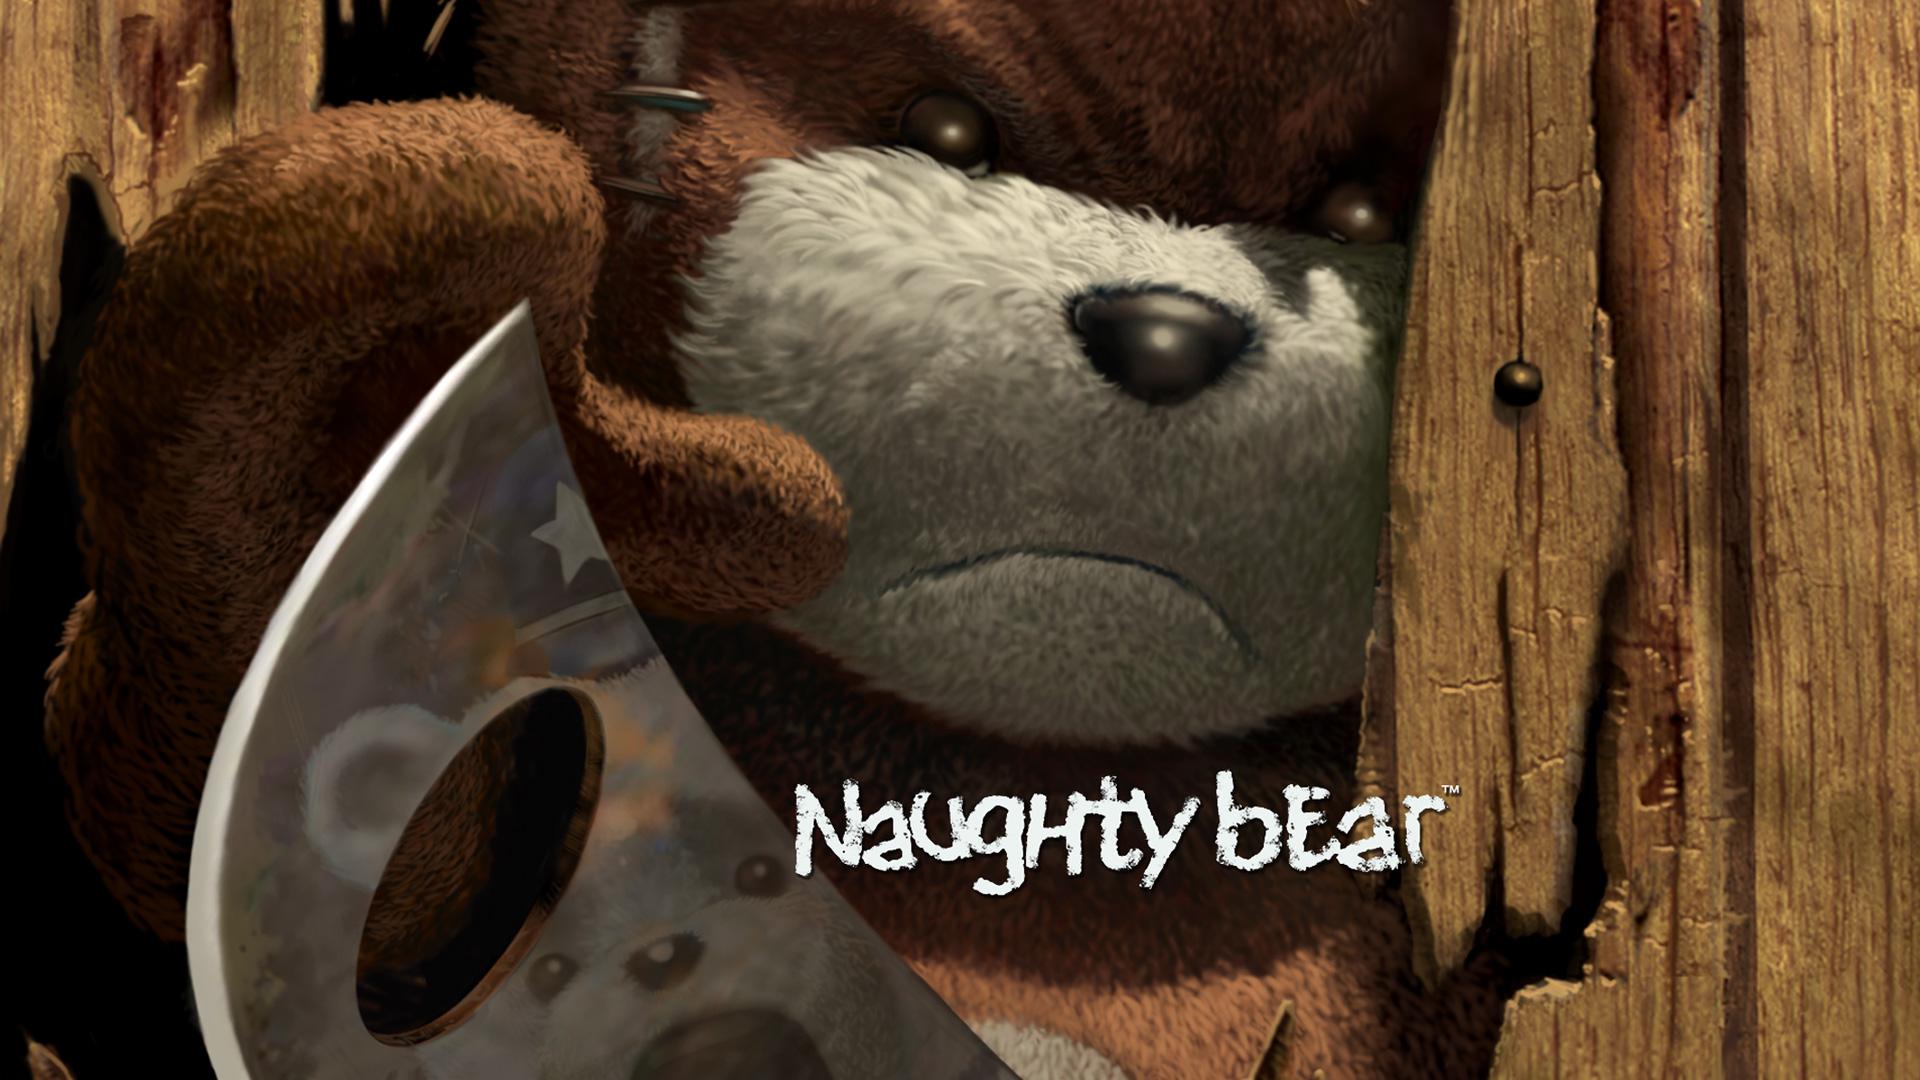 Naughty Bear wallpaper 3